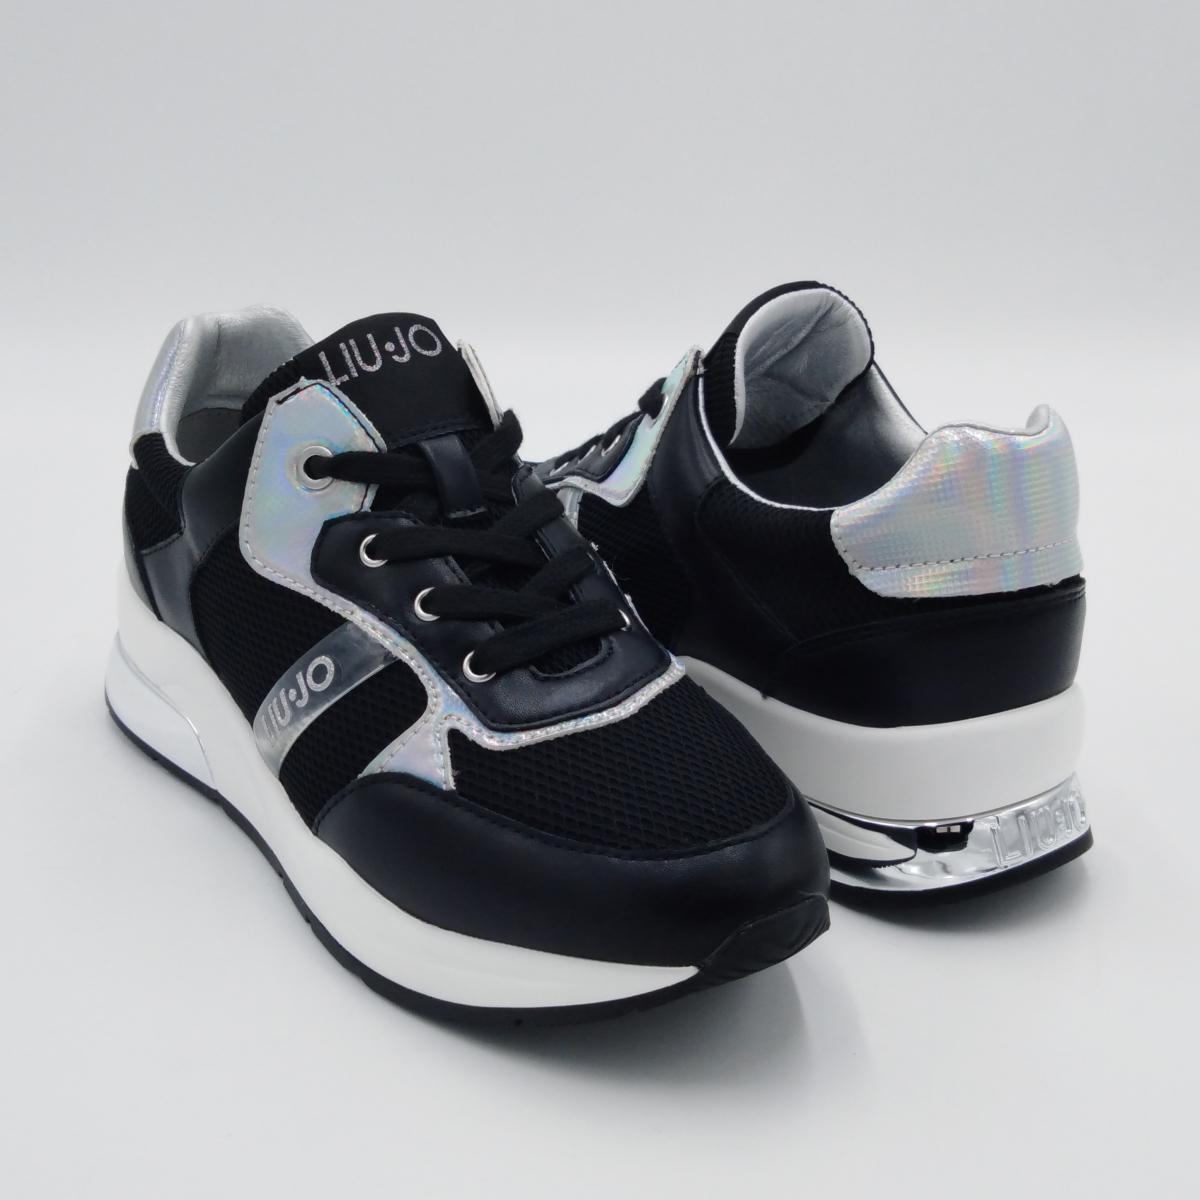 Liu Jo Karlie 80 -Sneaker...